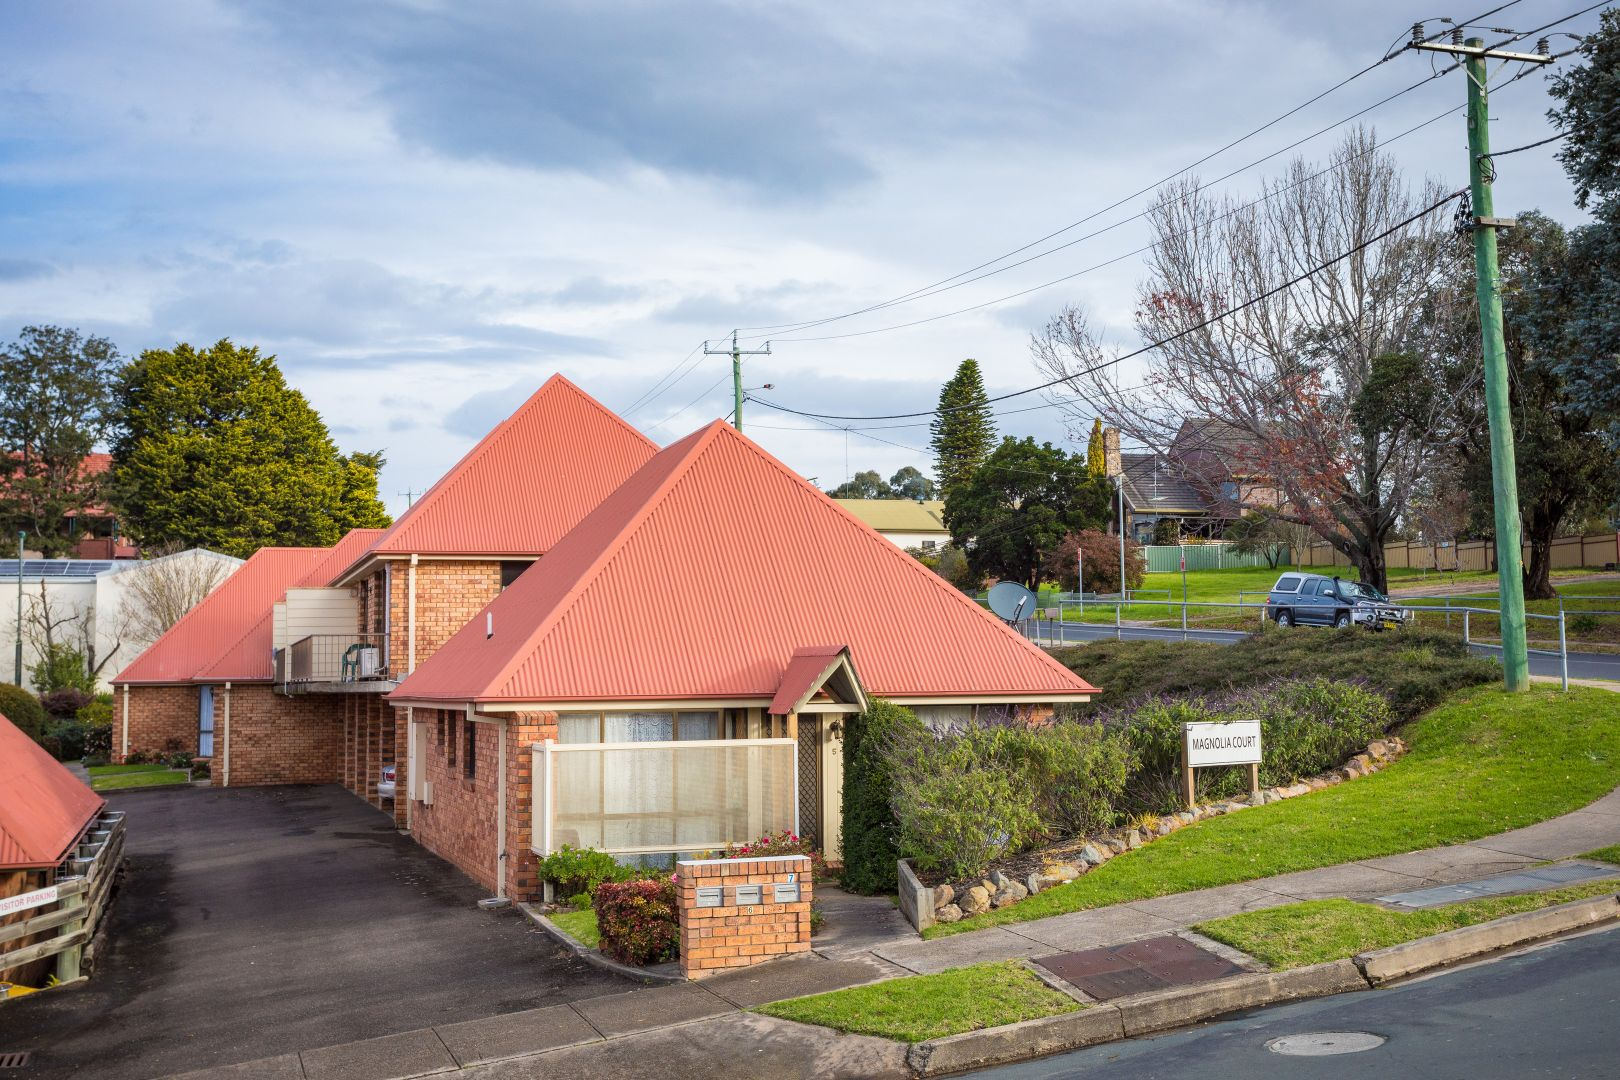 5/68 Upper Street, Bega NSW 2550, Image 1